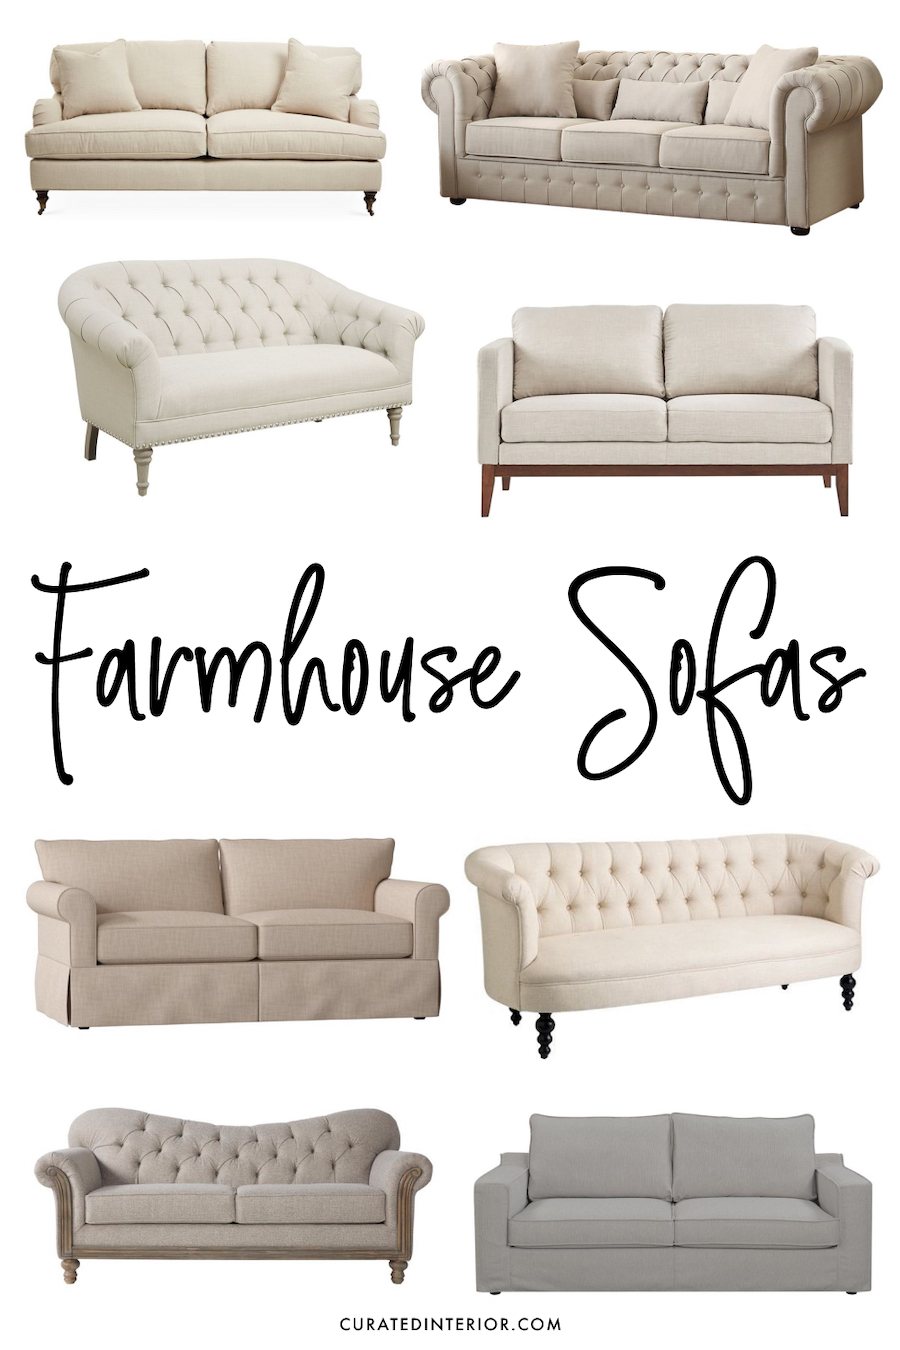 Farmhouse Style Sectional : farmhouse, style, sectional, Perfect, Farmhouse, Sofas, Budgets